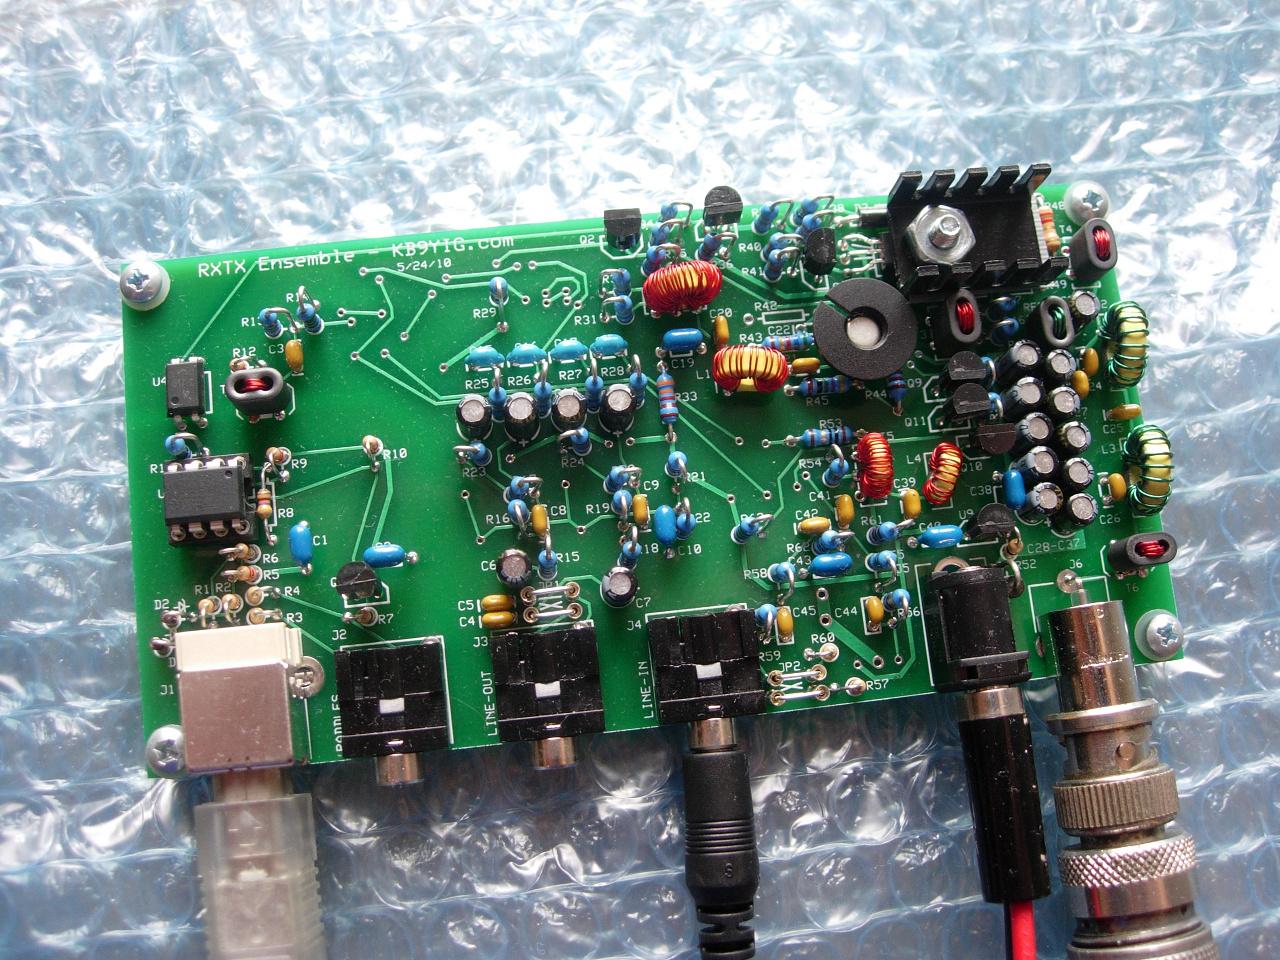 Radio Receiver Design Wikipedia Modulatorsdemodulators Littlesoft Electronics Software Defined Radioedit